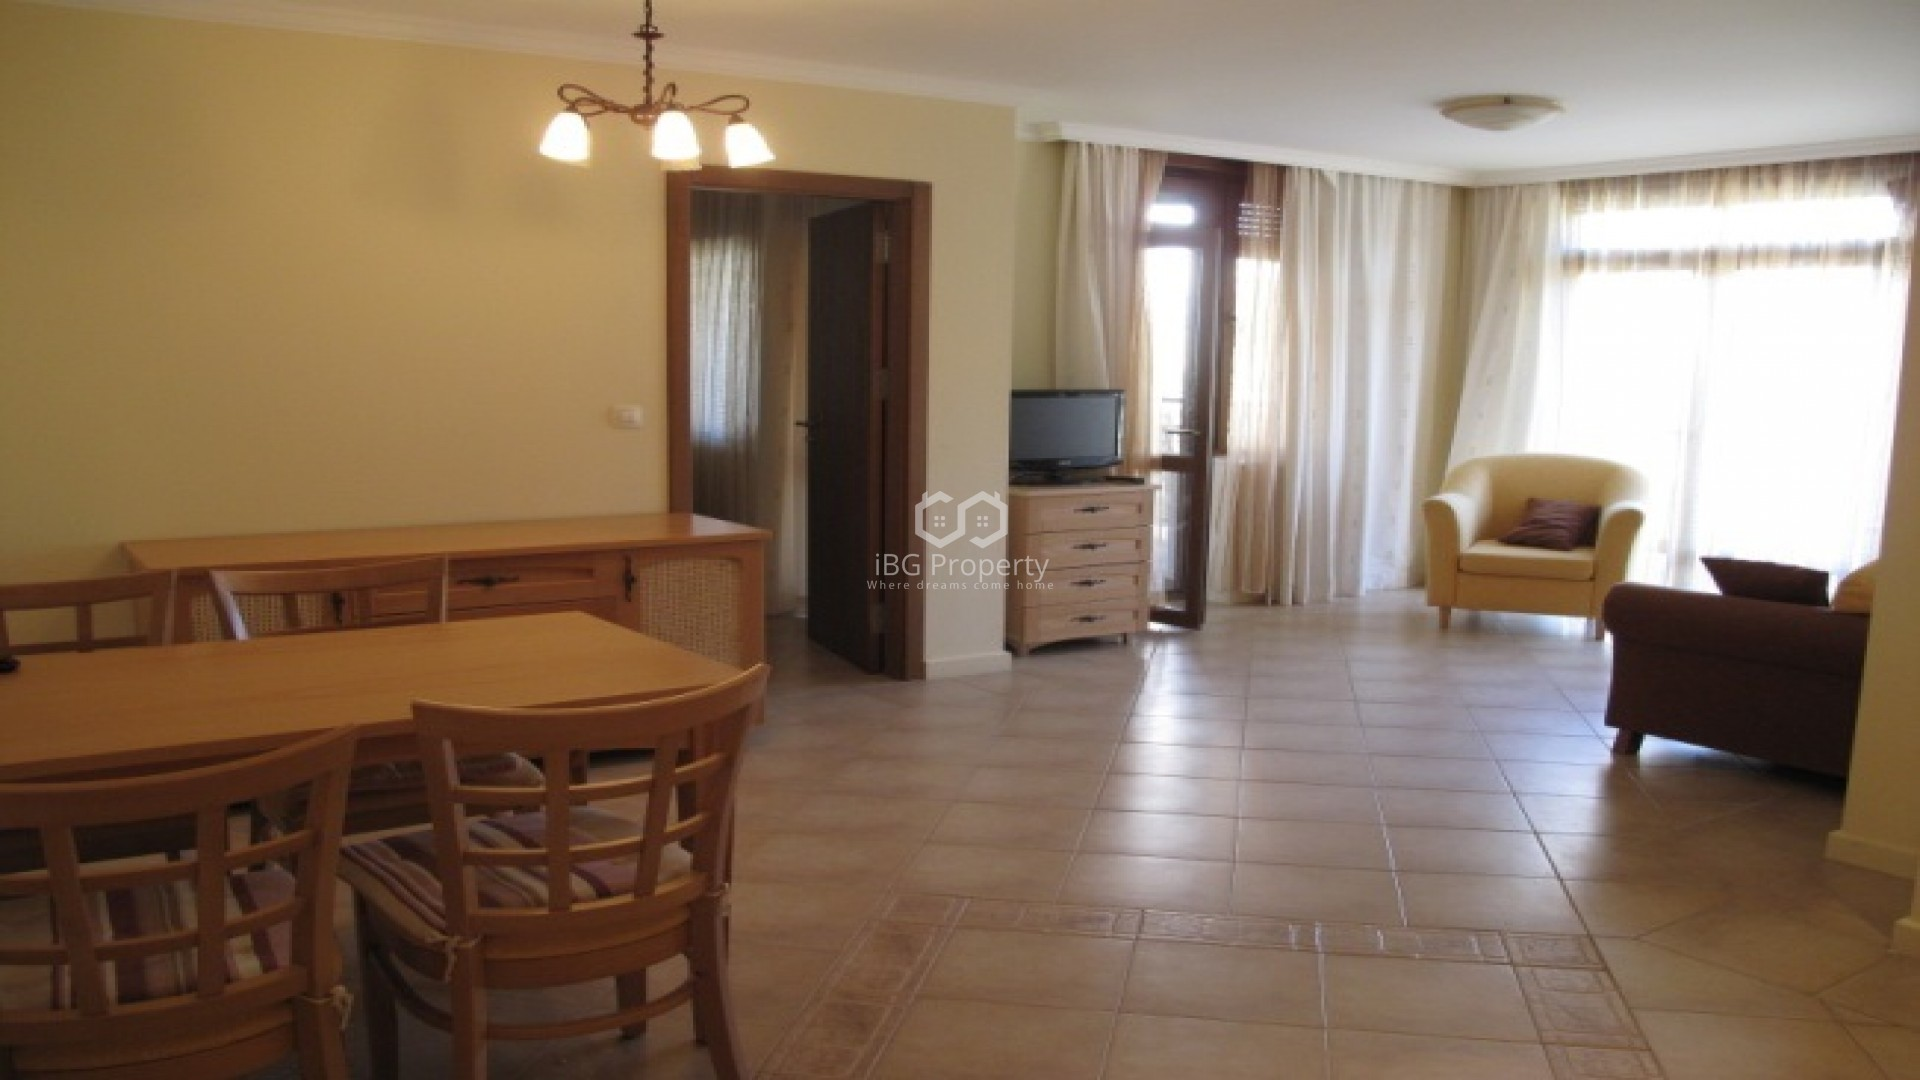 Двухкомнатная квартира Созопол  60 m2